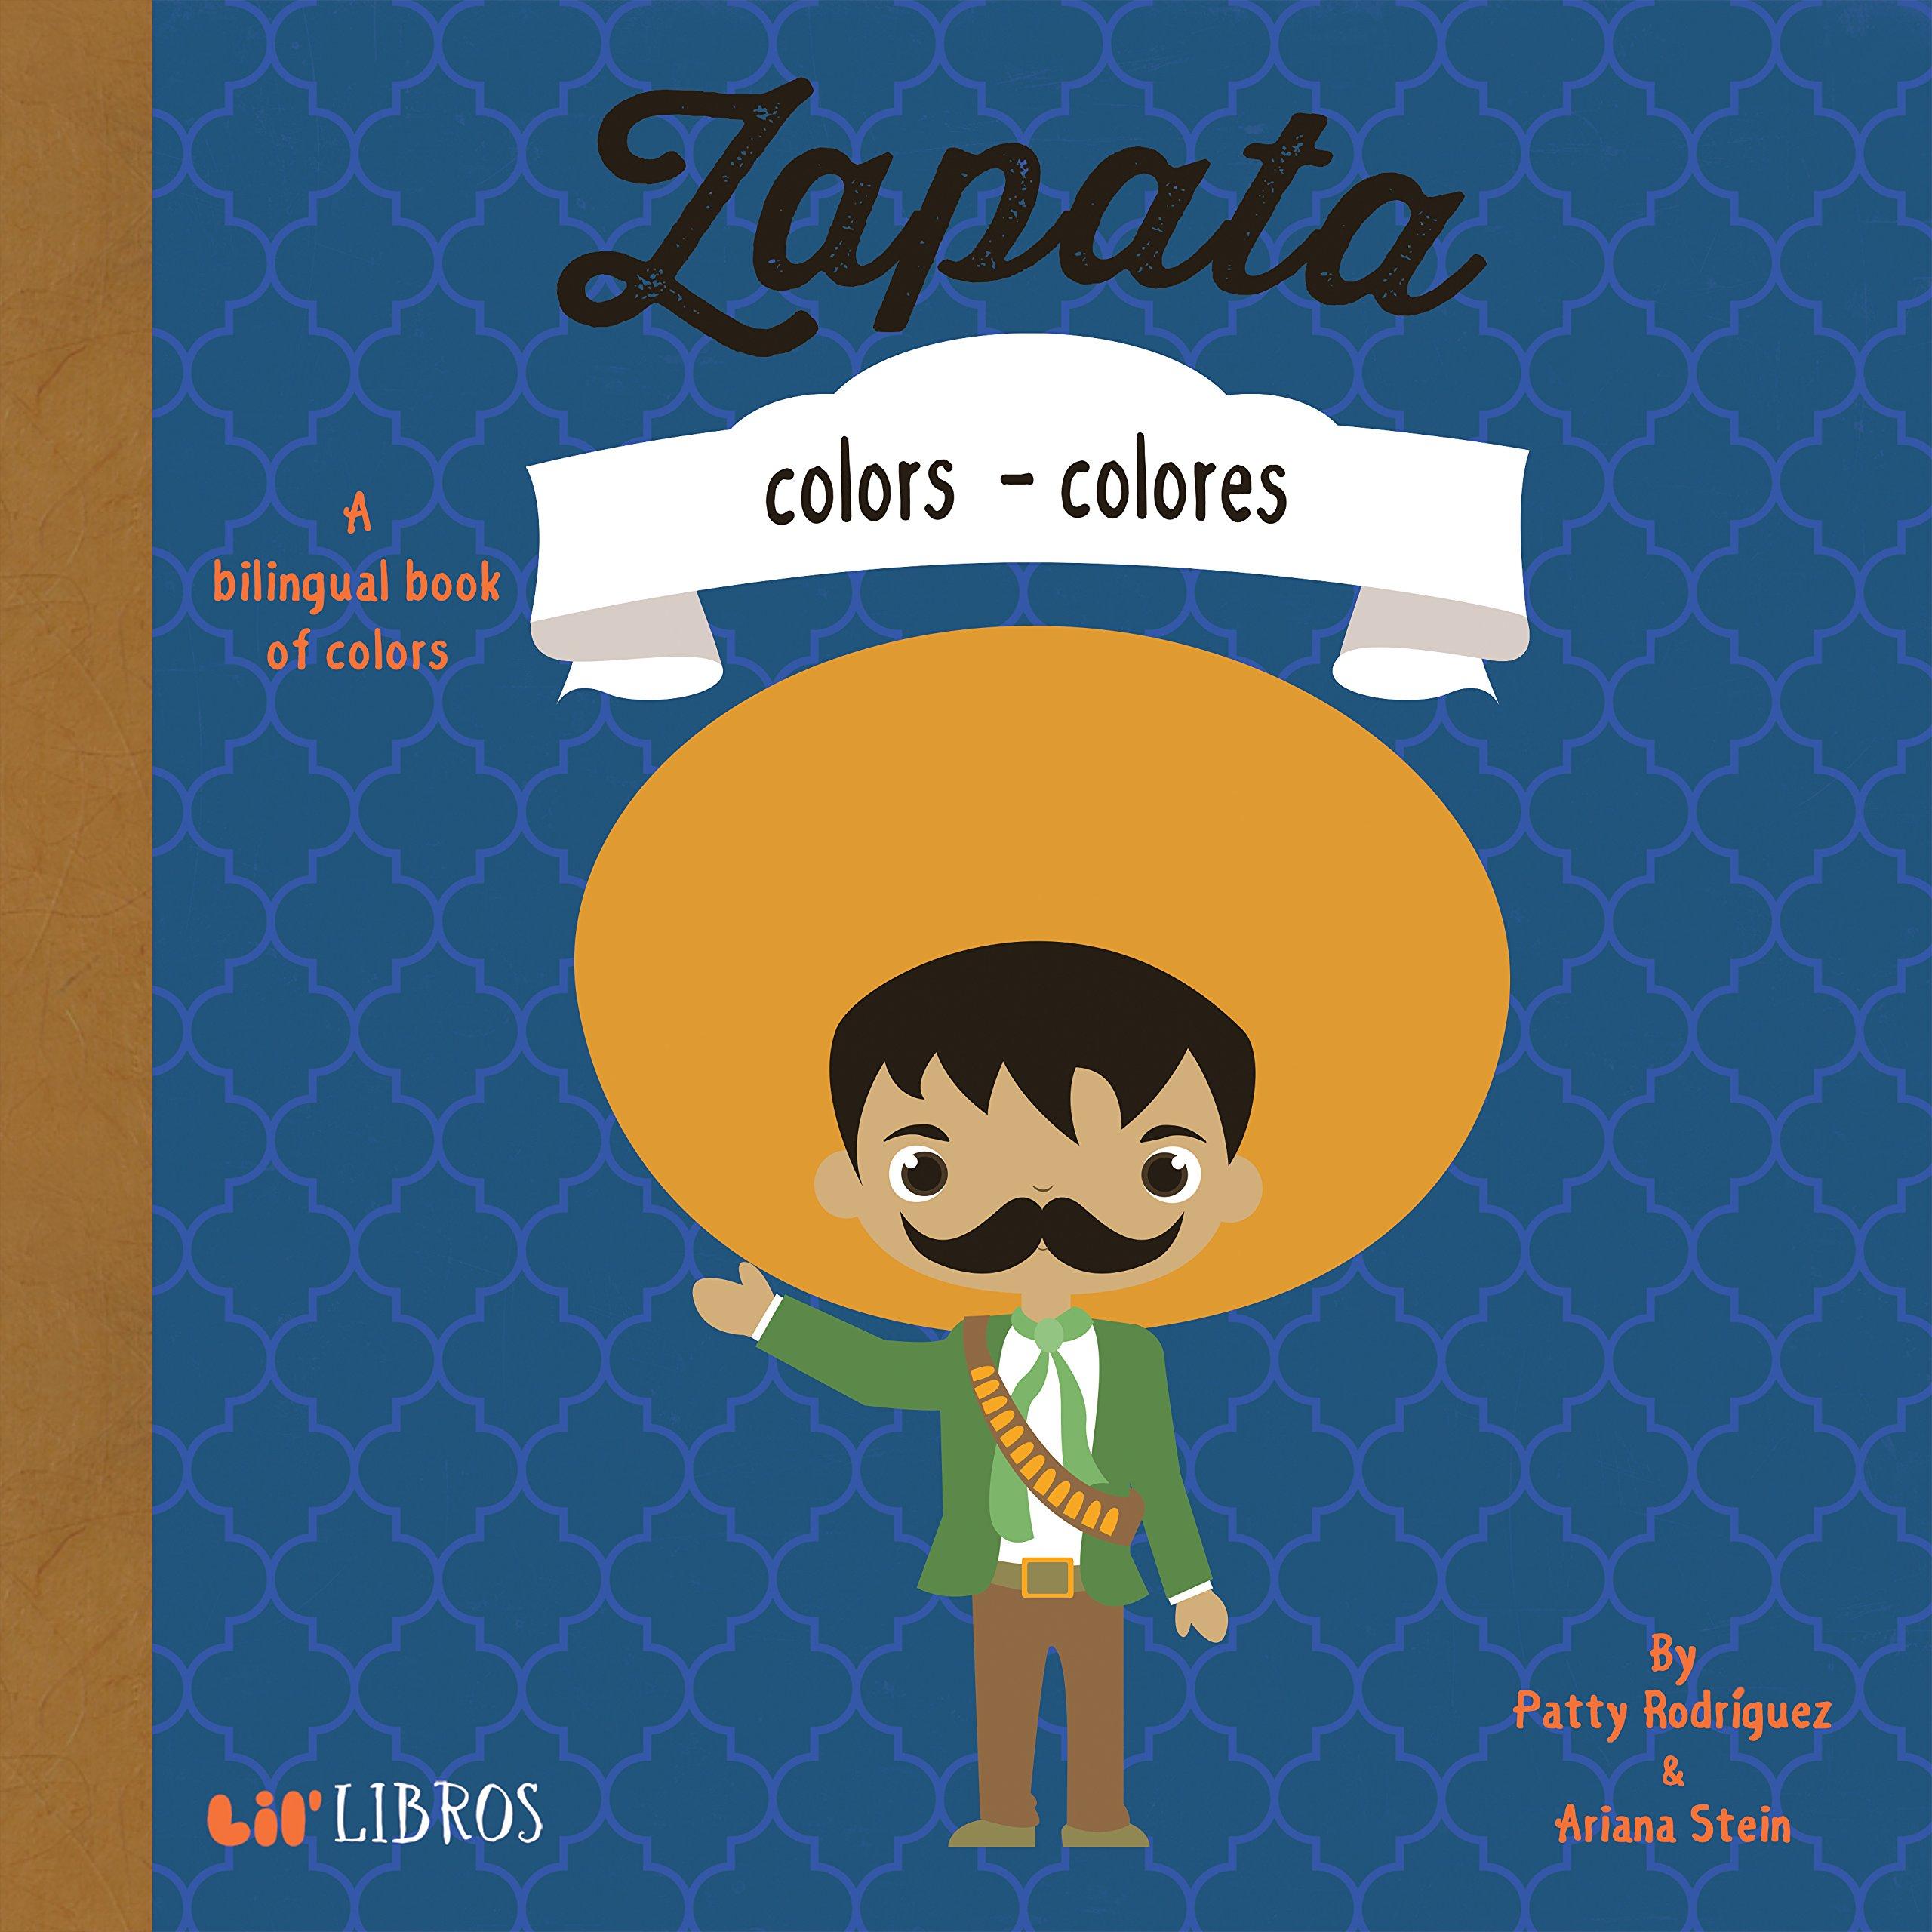 Amazon Zapata Colors Colores English and Spanish Edition